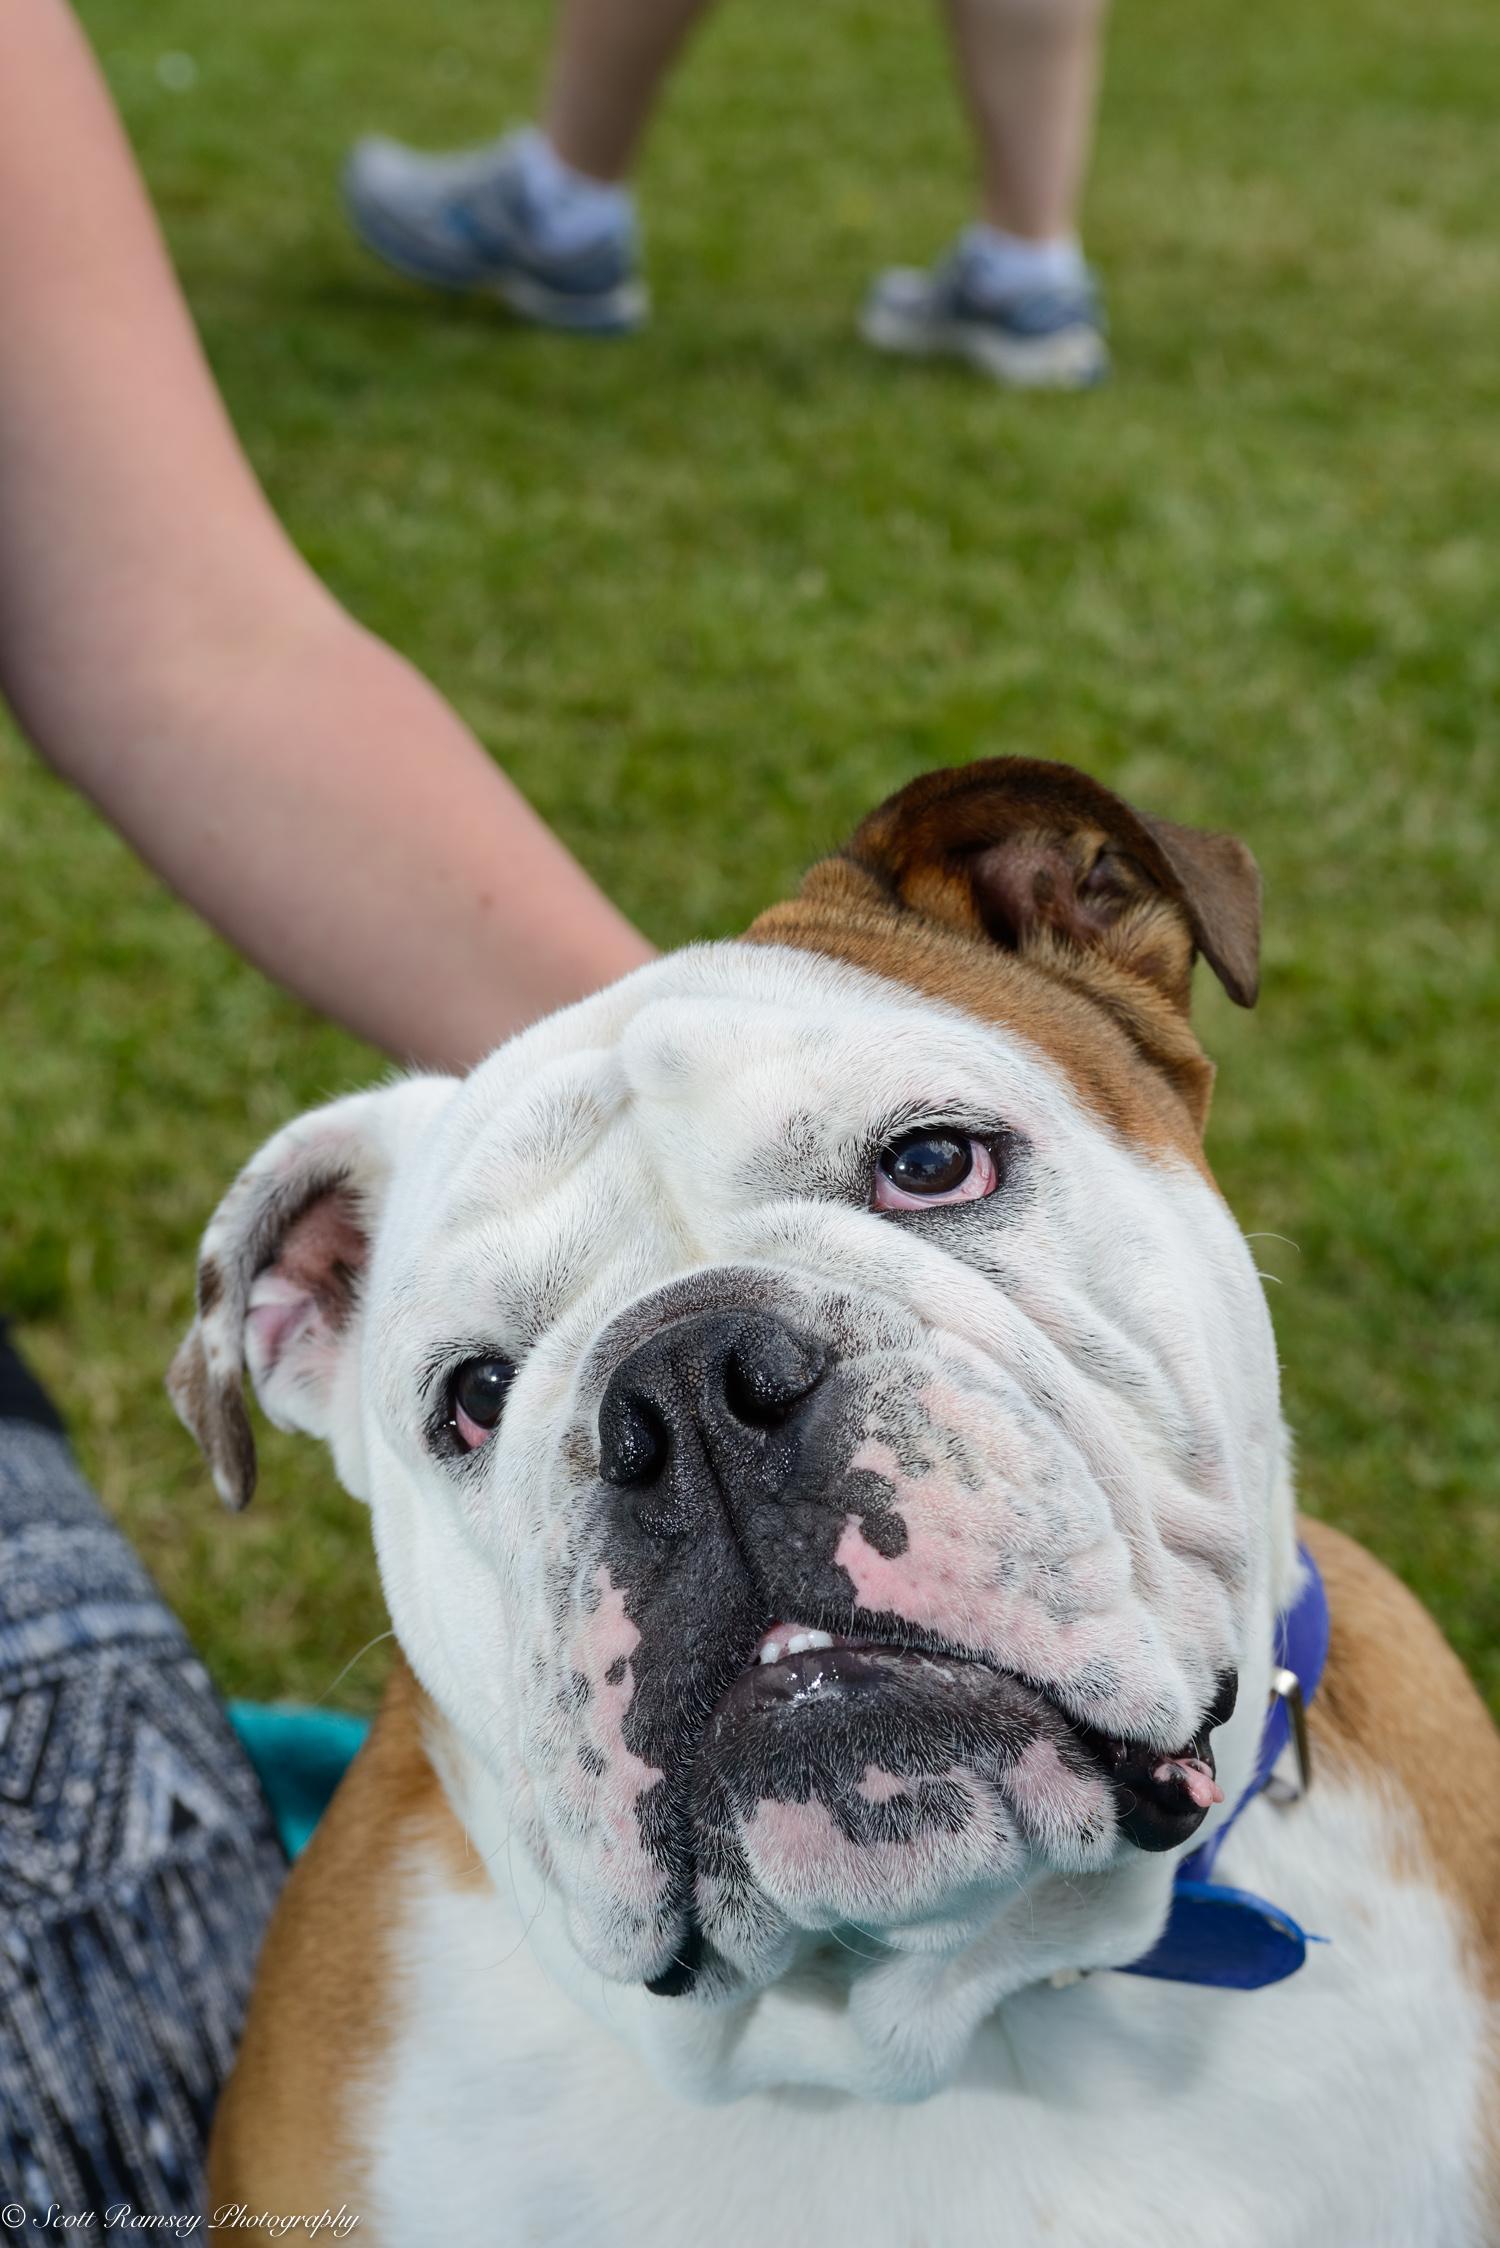 East Preston Dog Show